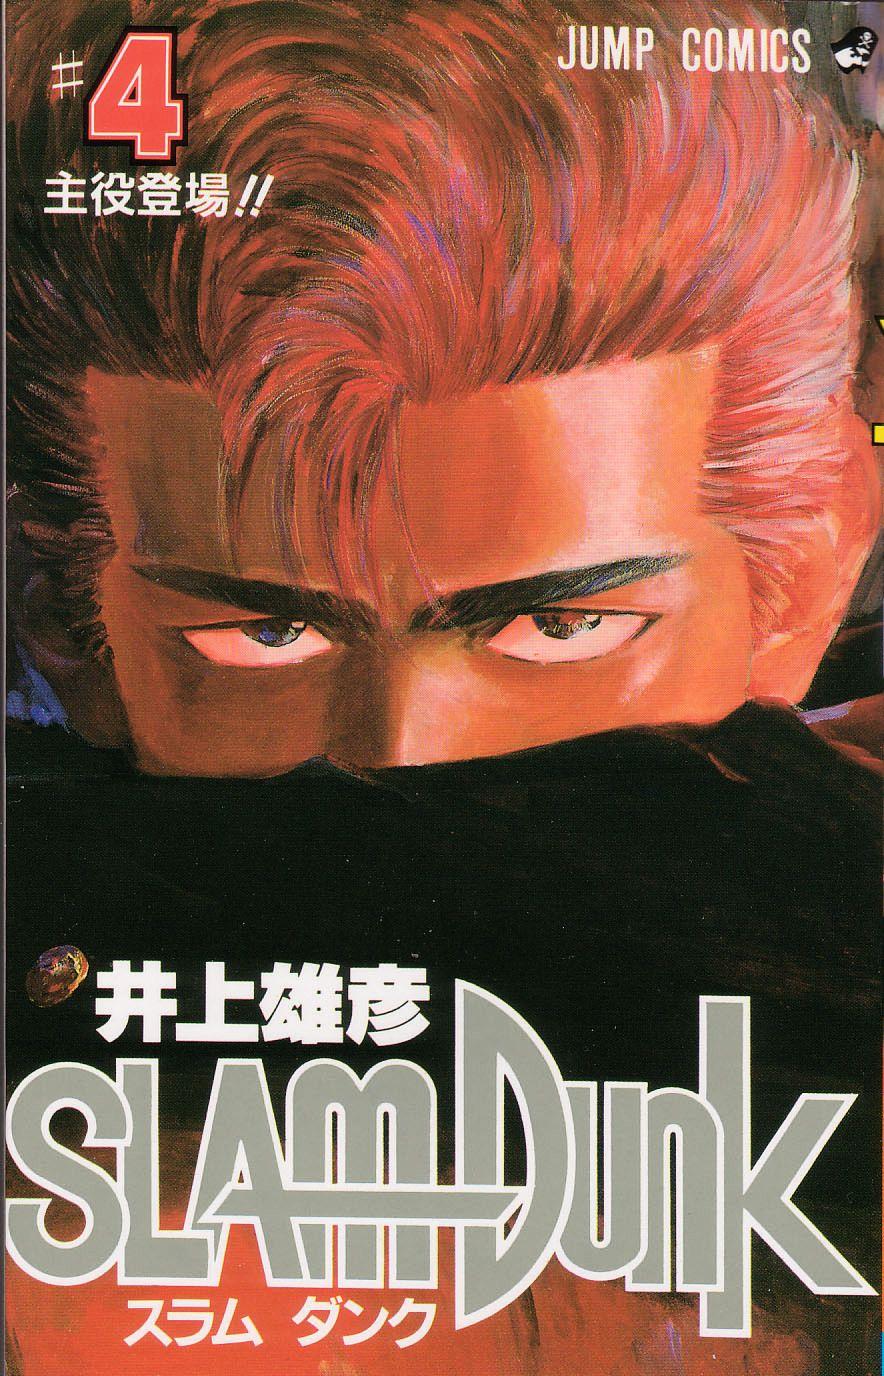 Slam Dunk 27 Read Slam Dunk vol.4 ch.27 Online For Free